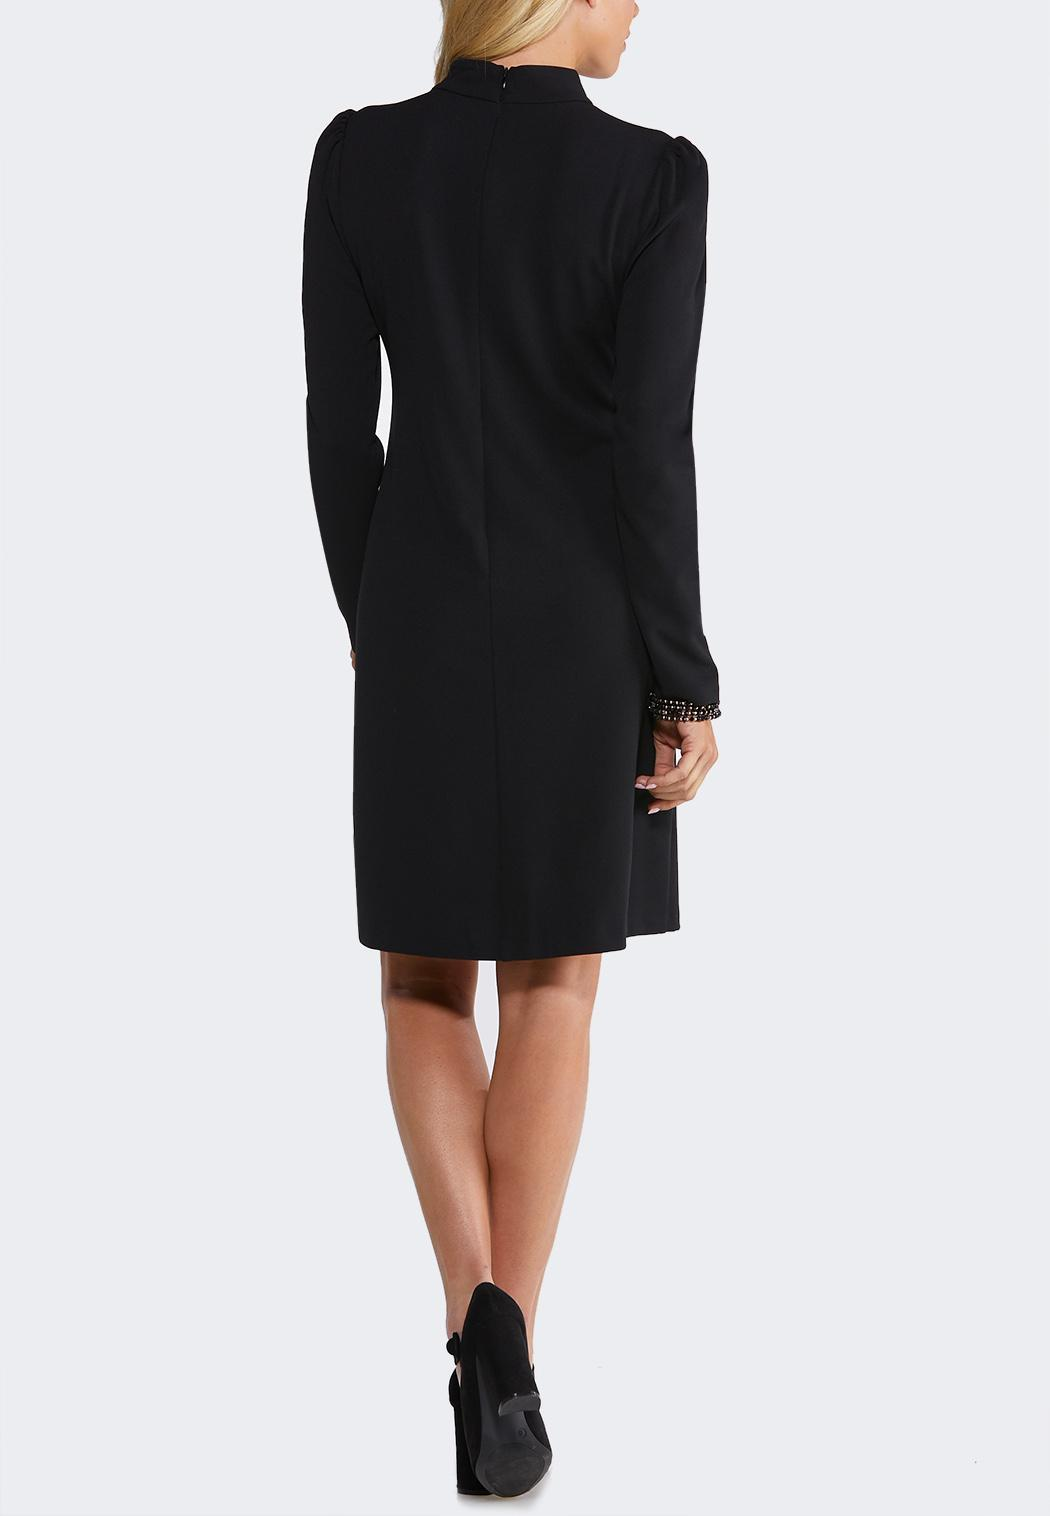 Plus Size Black Puff Shoulder Dress (Item #44117529)